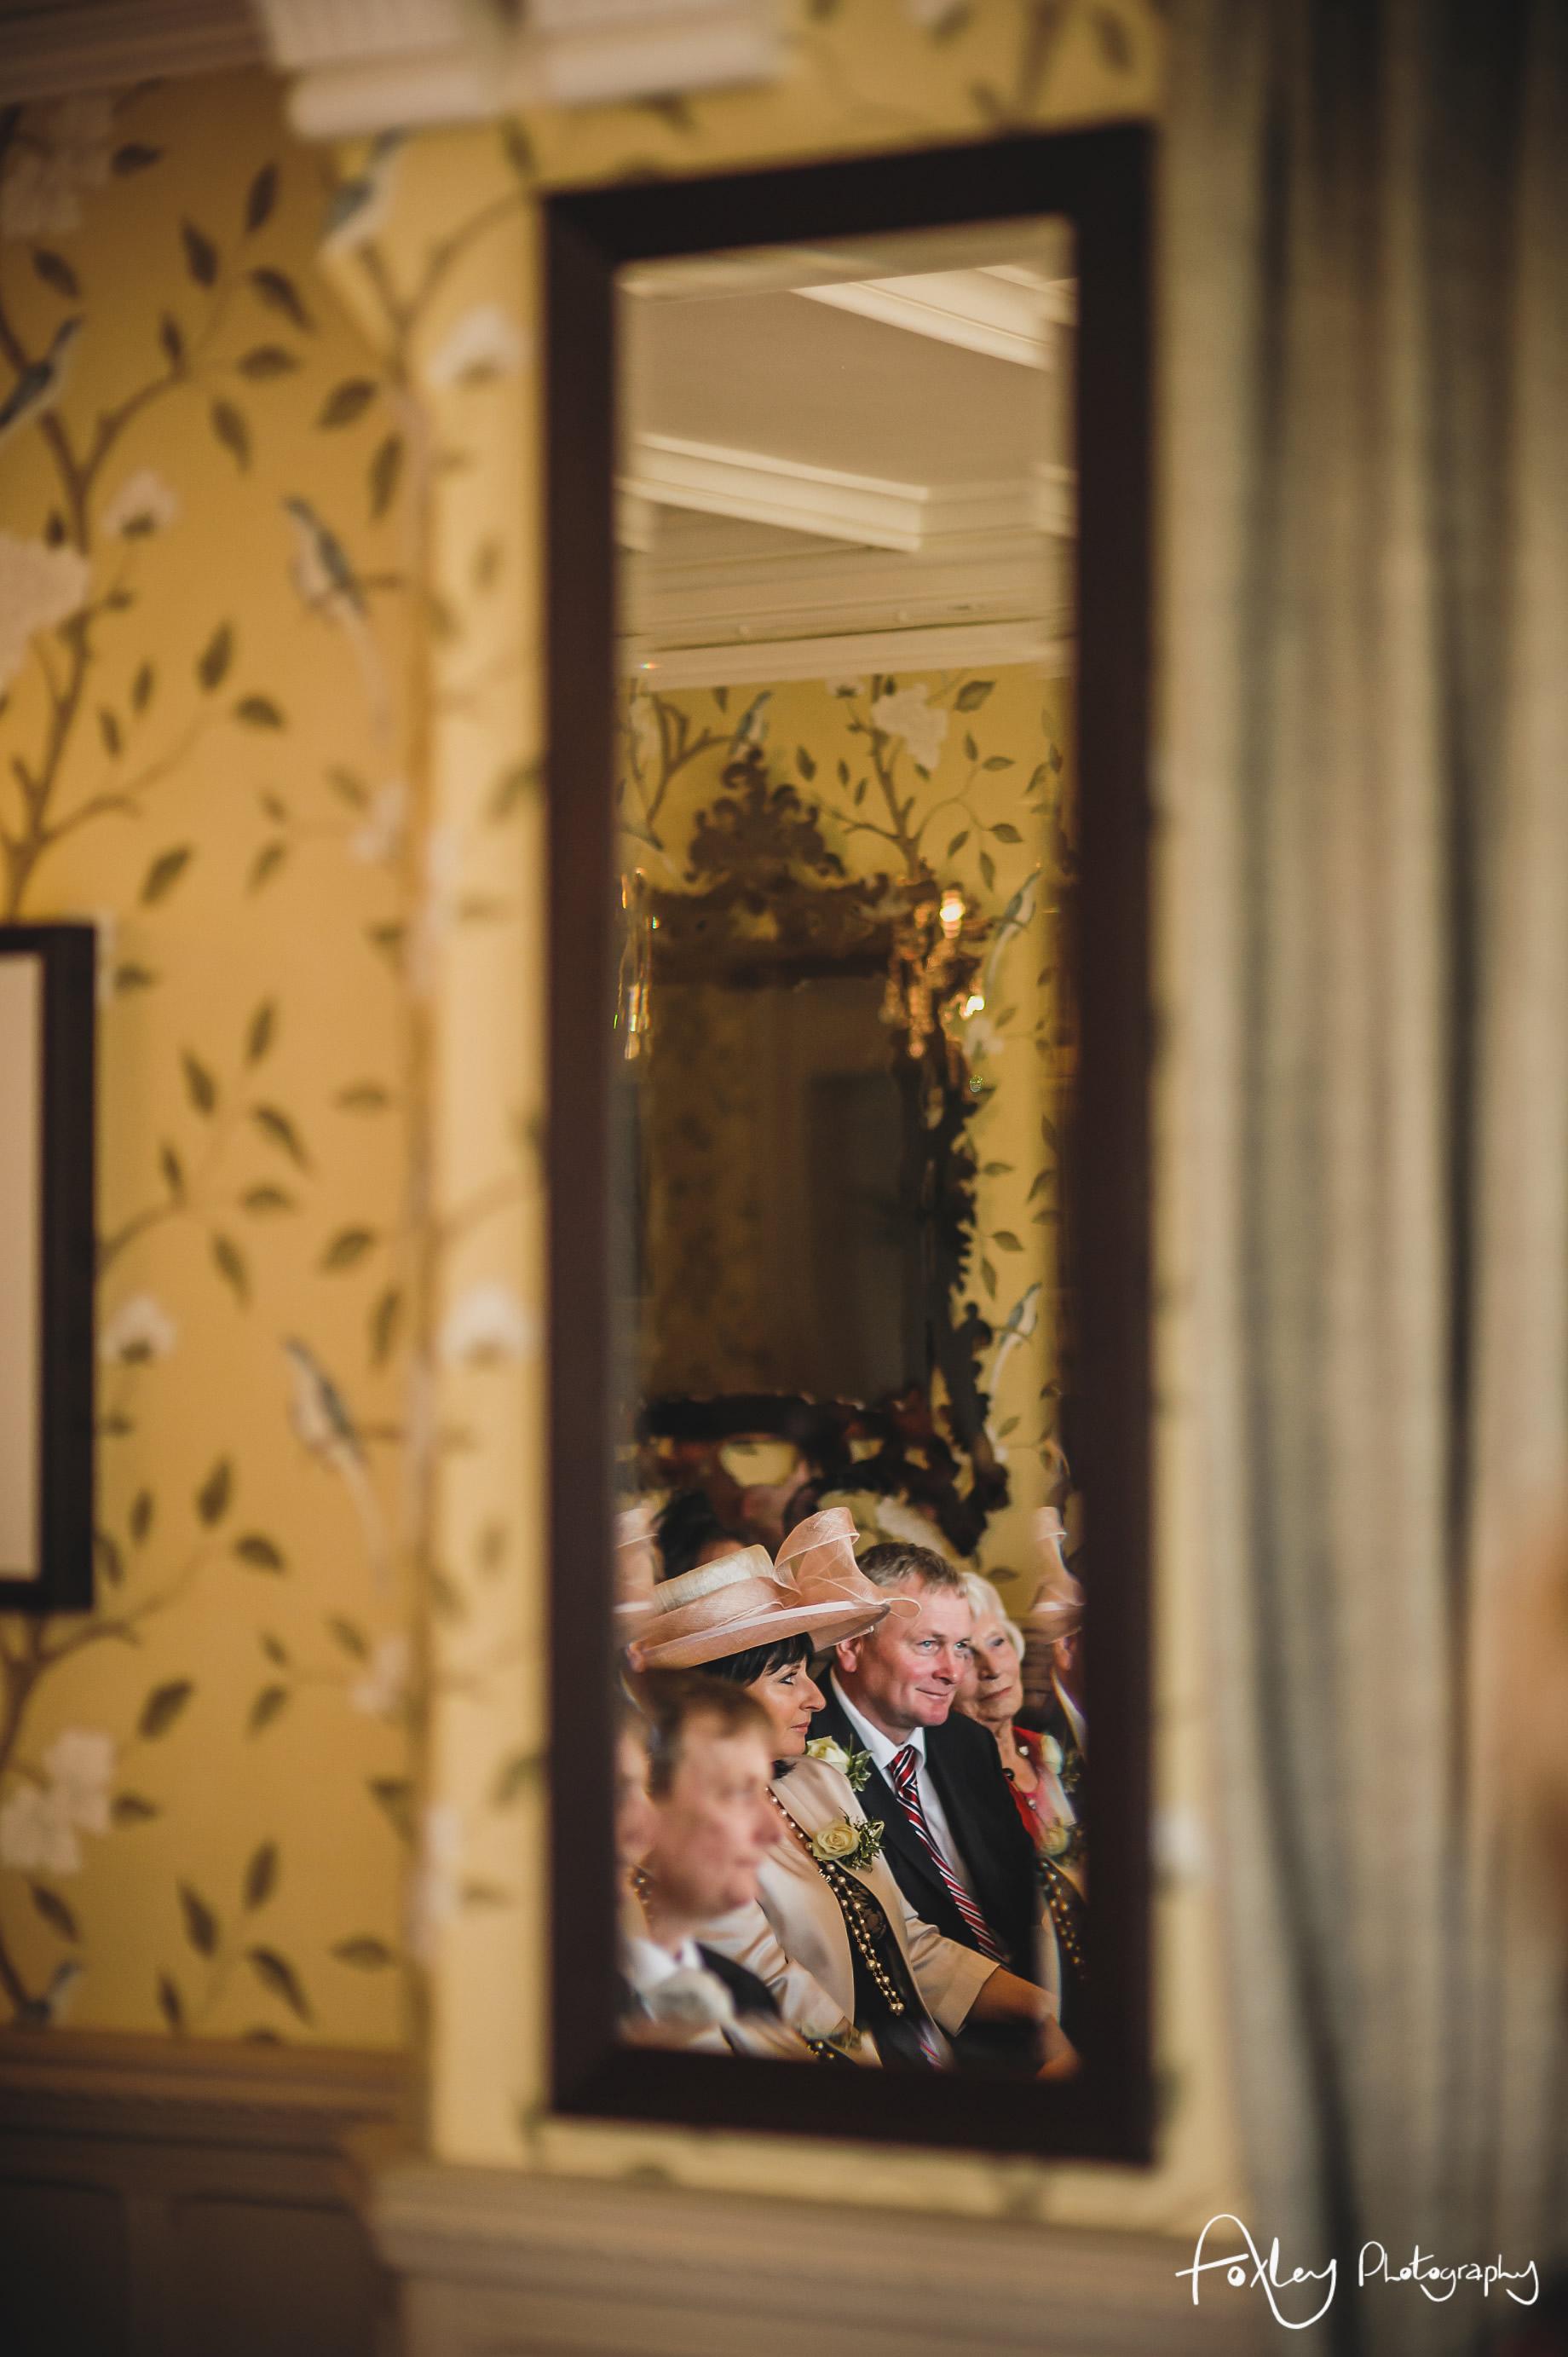 Gemma and Lewis' Wedding at Mitton Hall 085